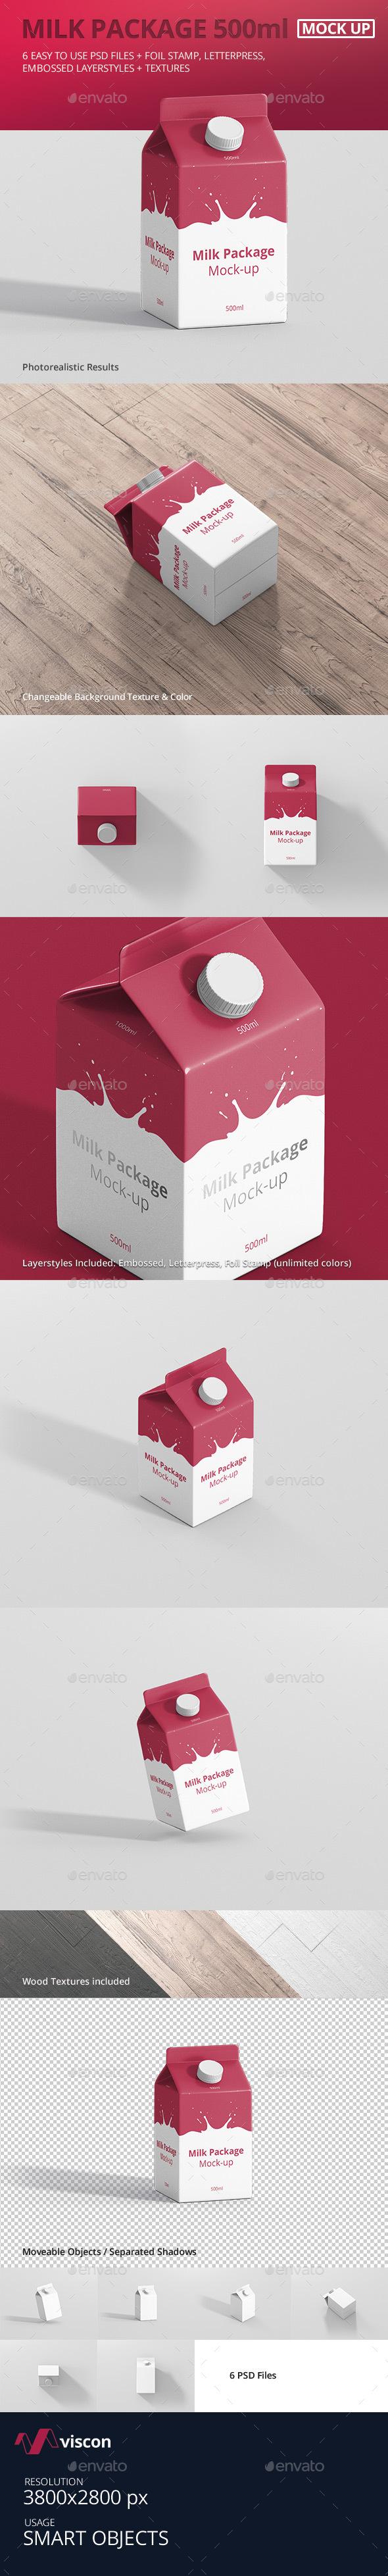 Juice / Milk Mockup - 500ml Carton Box - Food and Drink Packaging